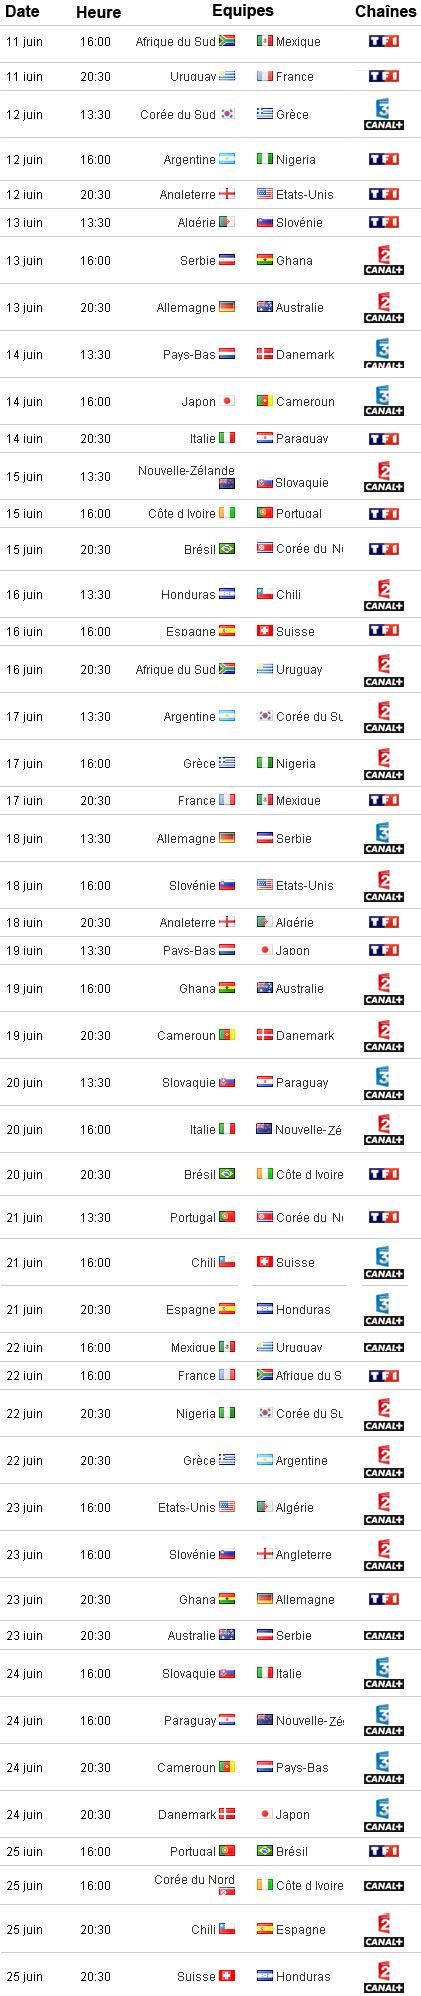 agenda-calendrier-match-coupe-du-monde-football-2010